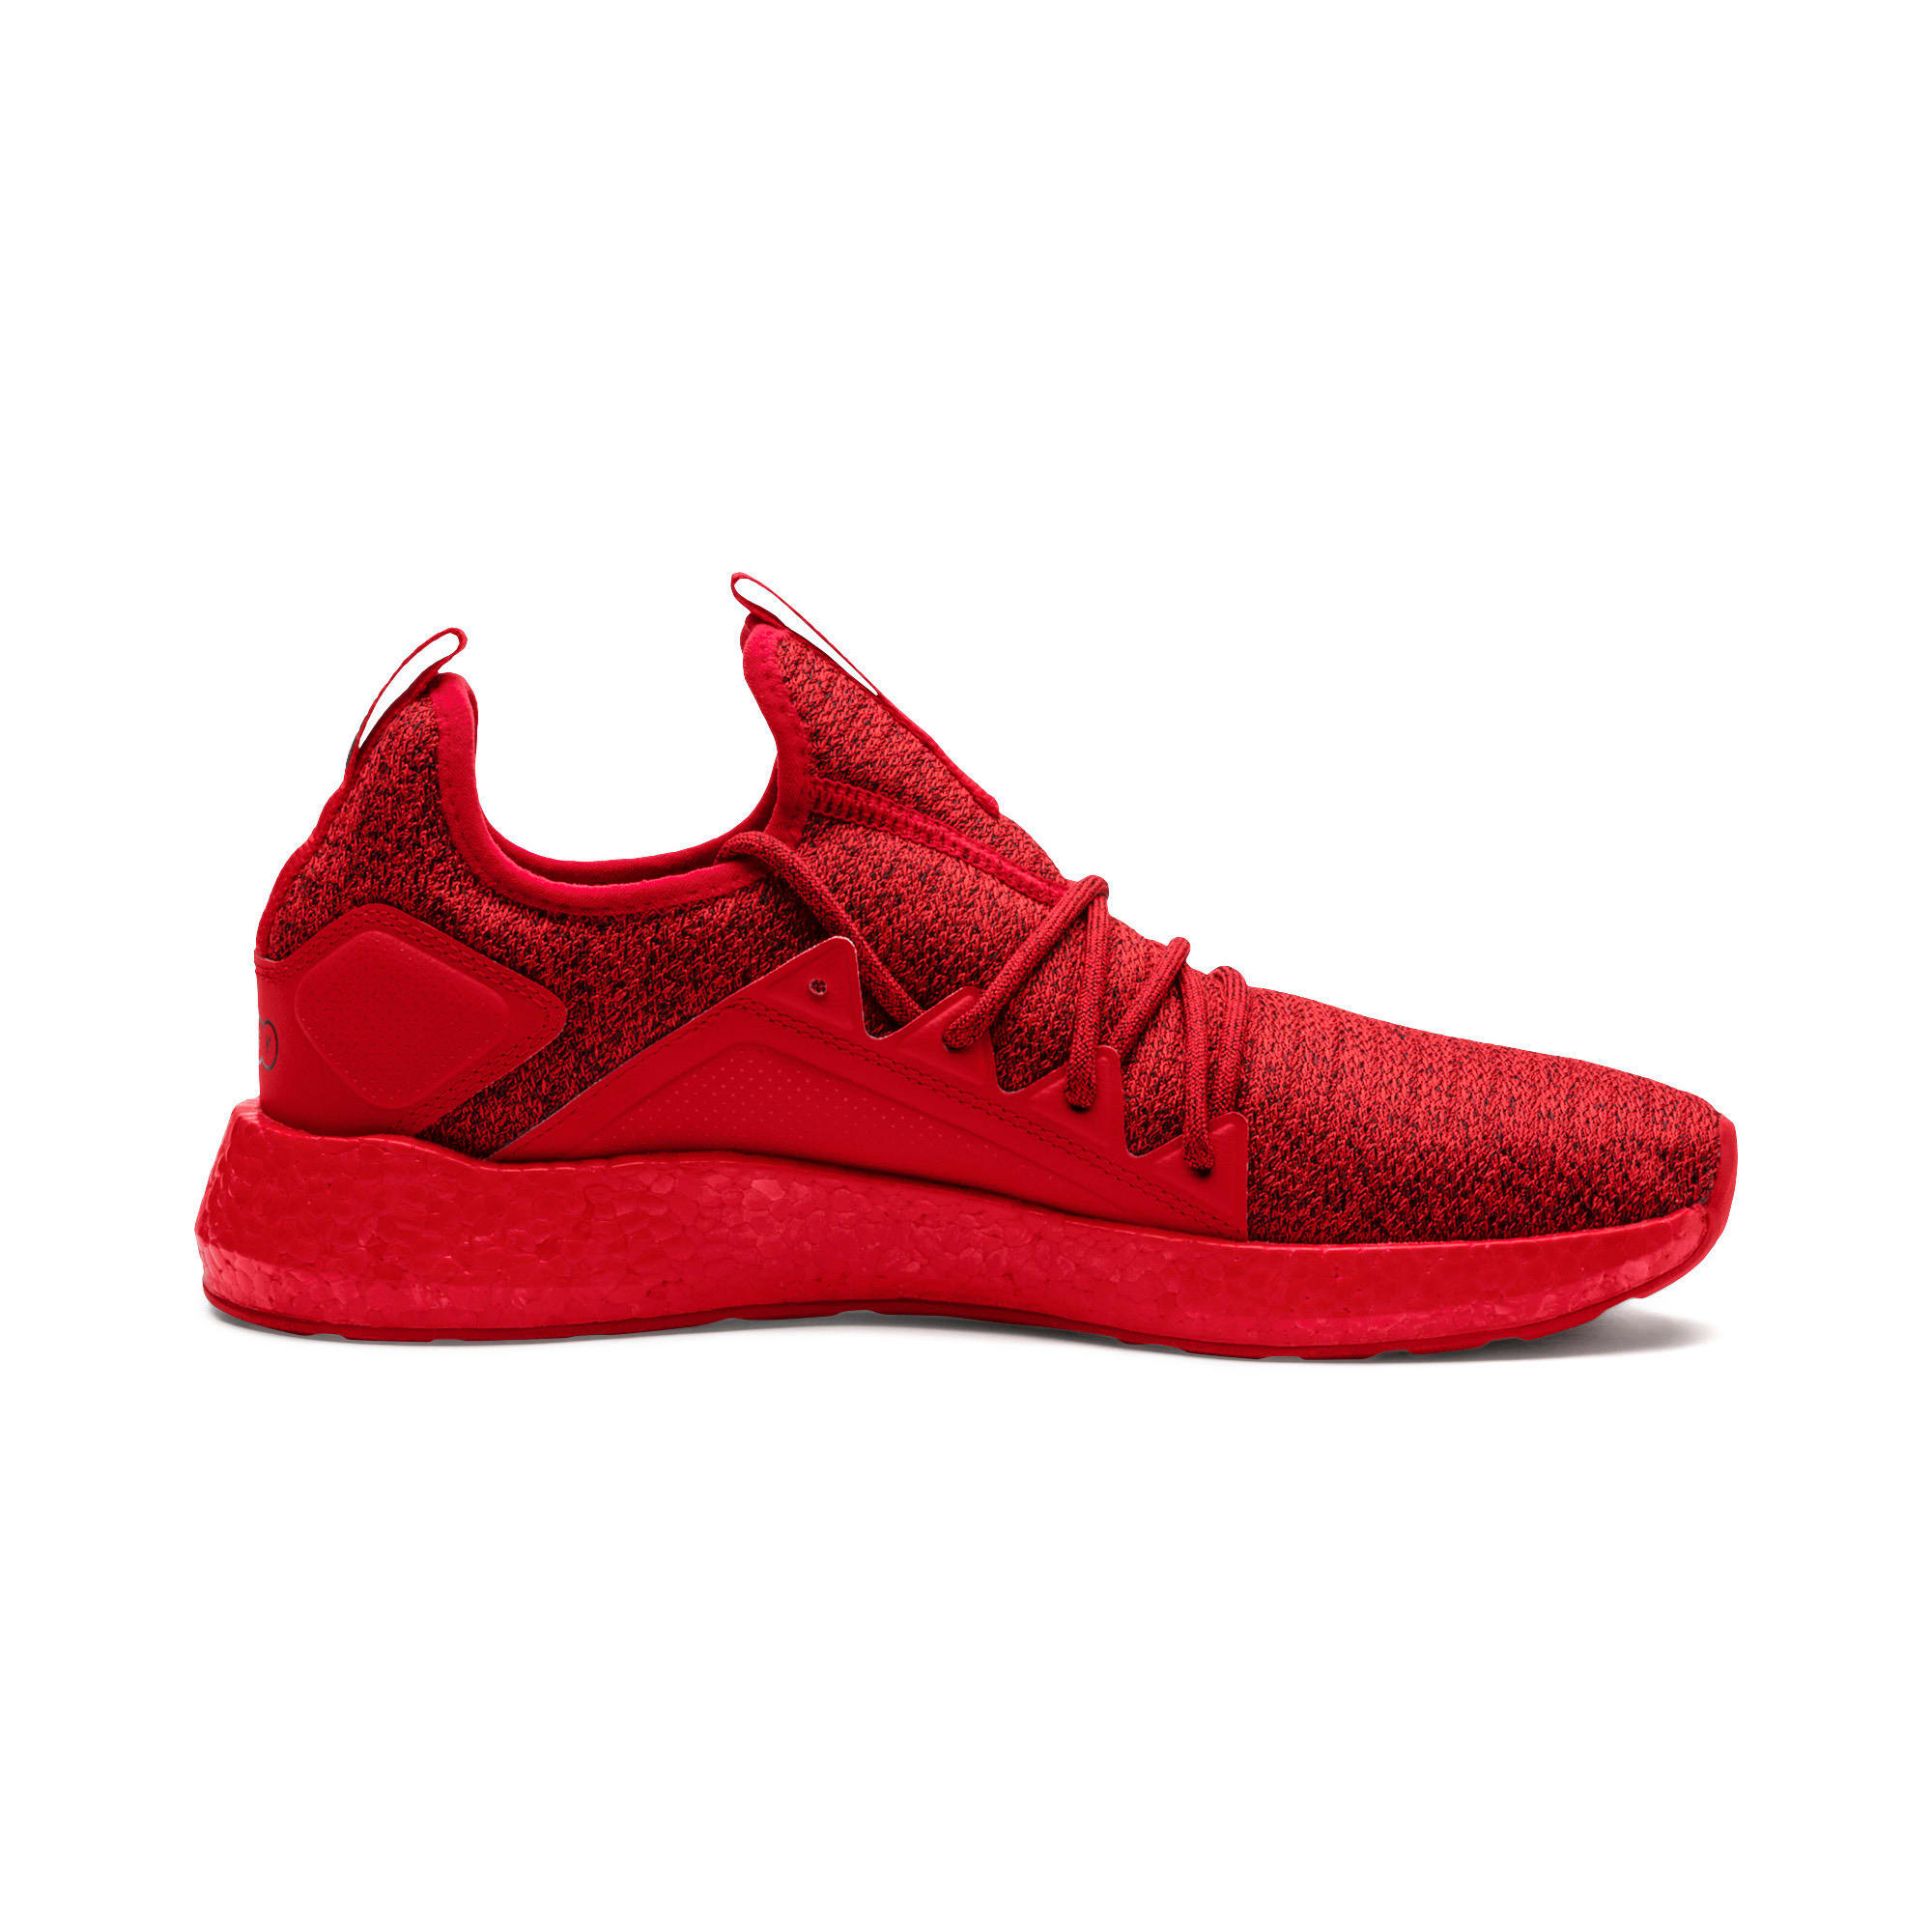 Thumbnail 5 of NRGY Neko Knit Men's Running Shoes, High Risk Red-Puma Black, medium